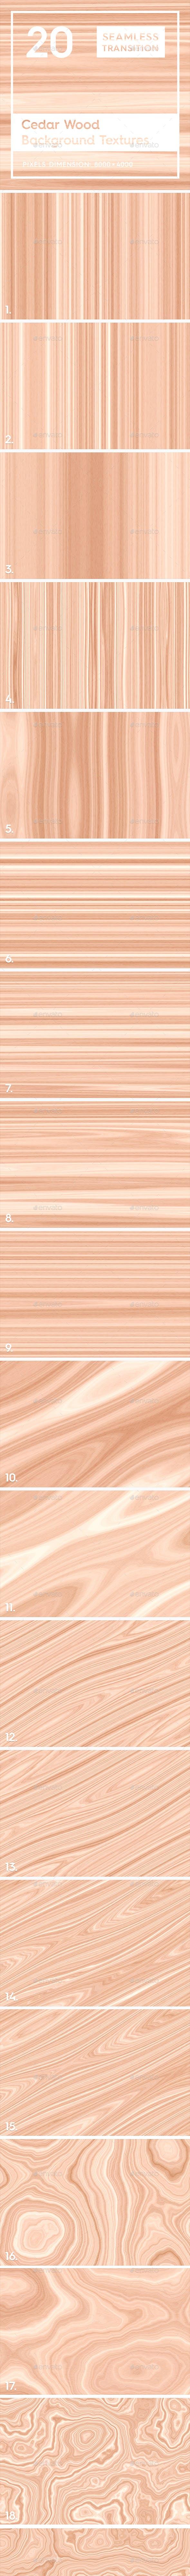 20 Cedar Wood Background Textures - 3DOcean Item for Sale